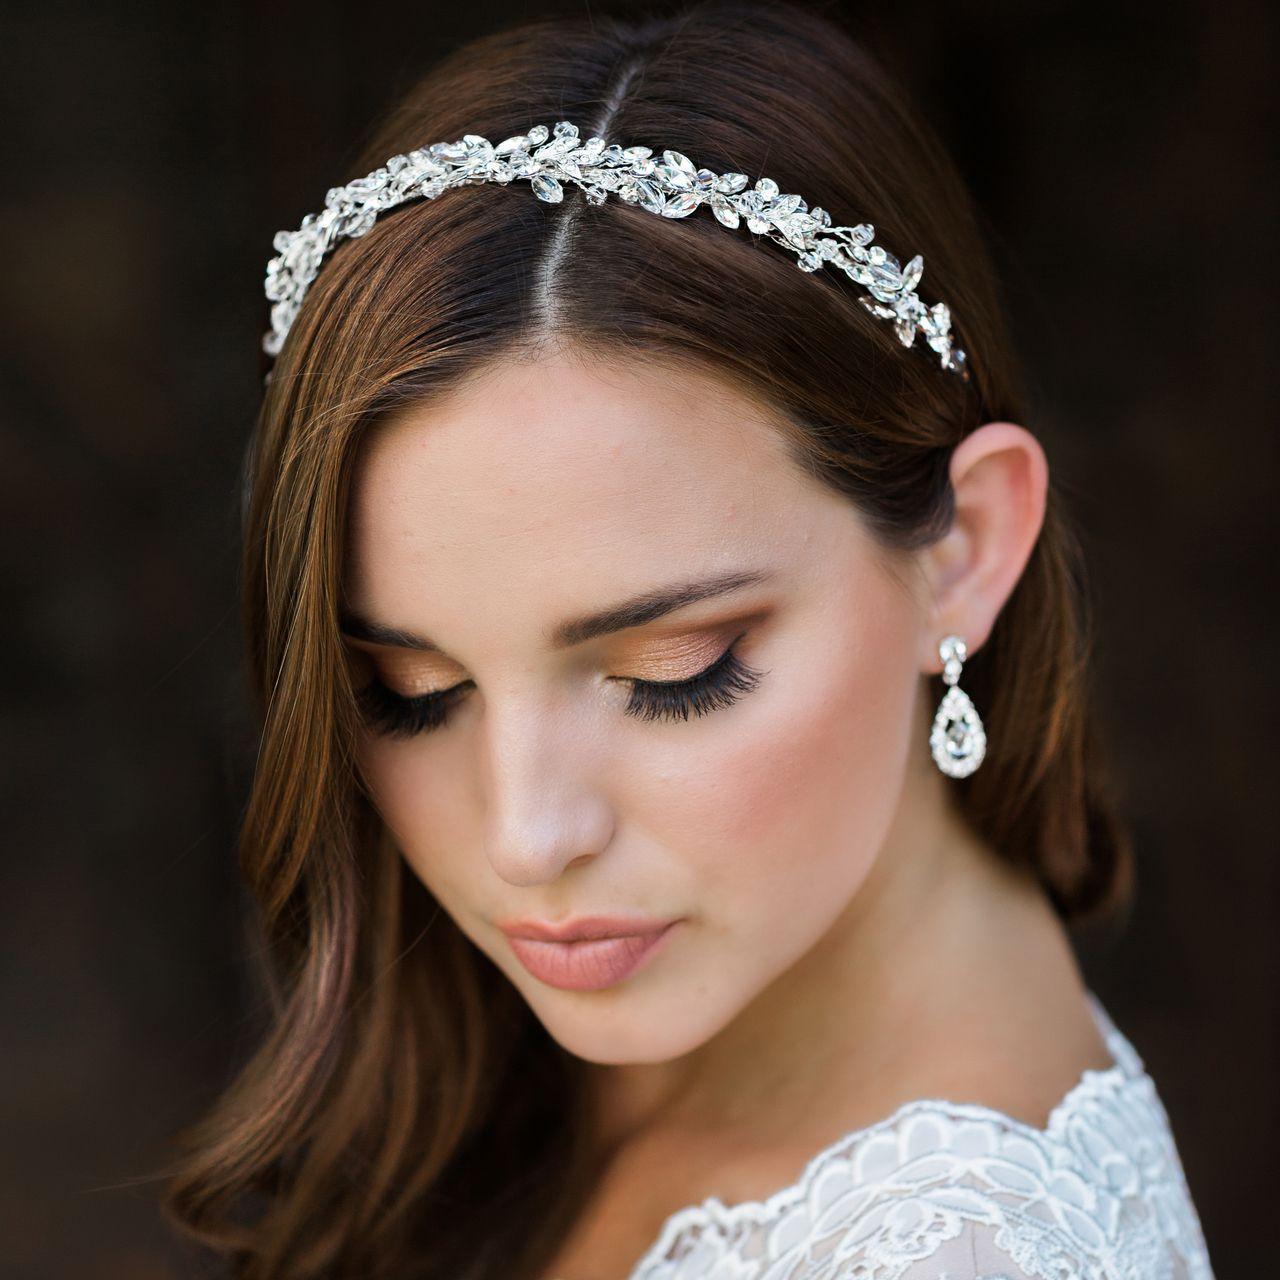 Bridal headband hb1910 wedding hair accessories